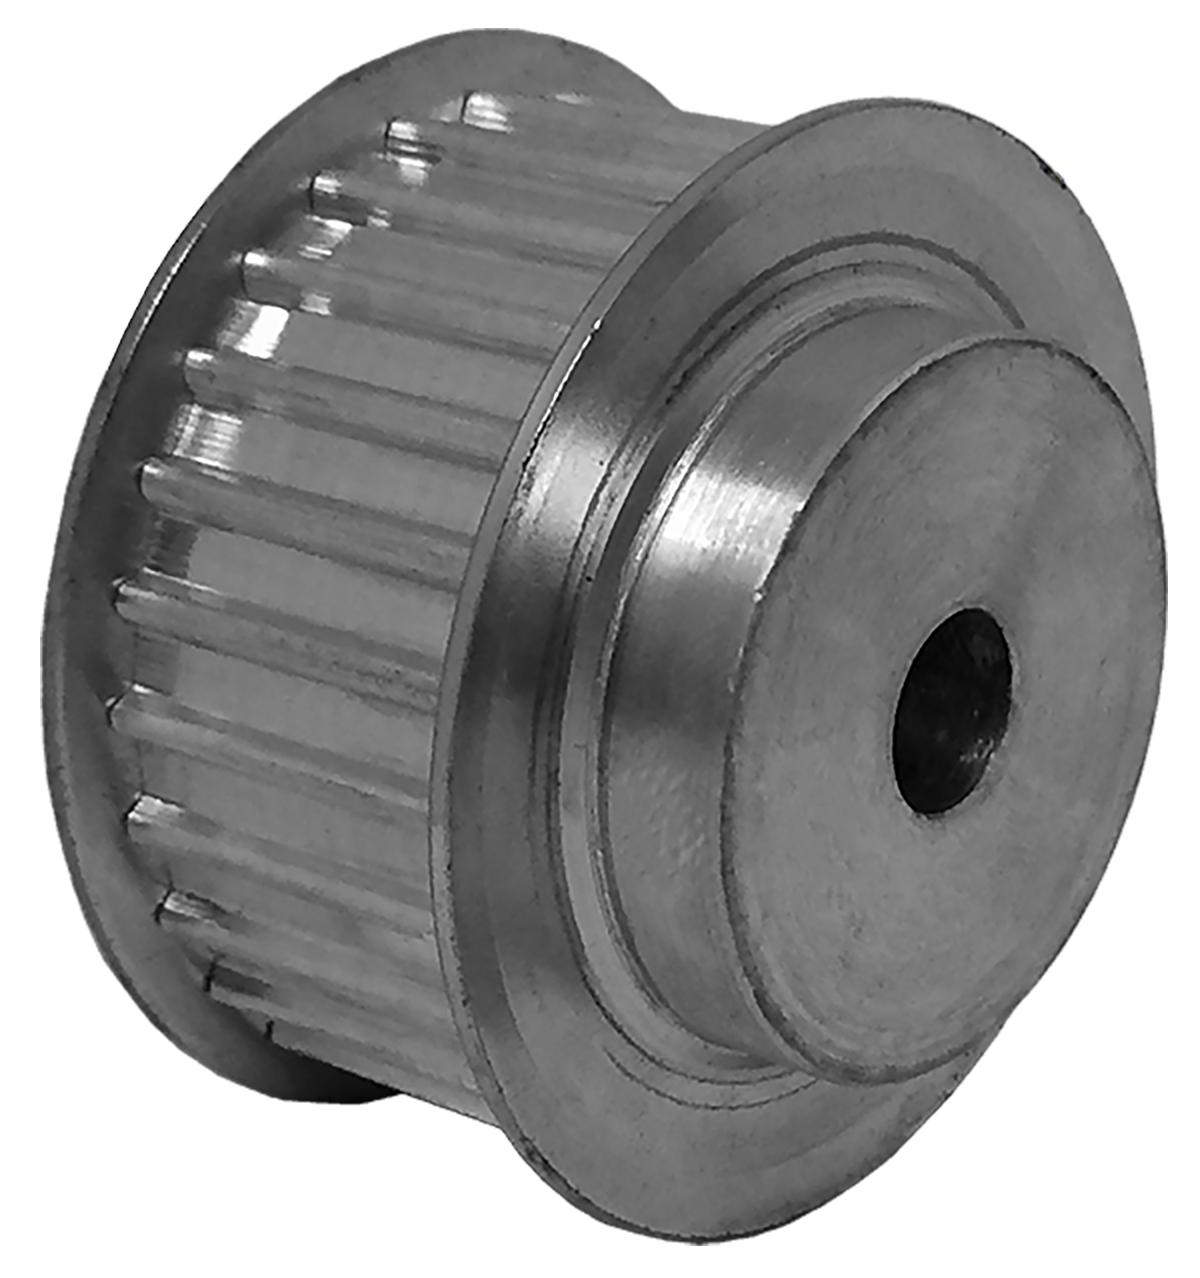 27AT5/27-2 - Aluminum Metric Pulleys